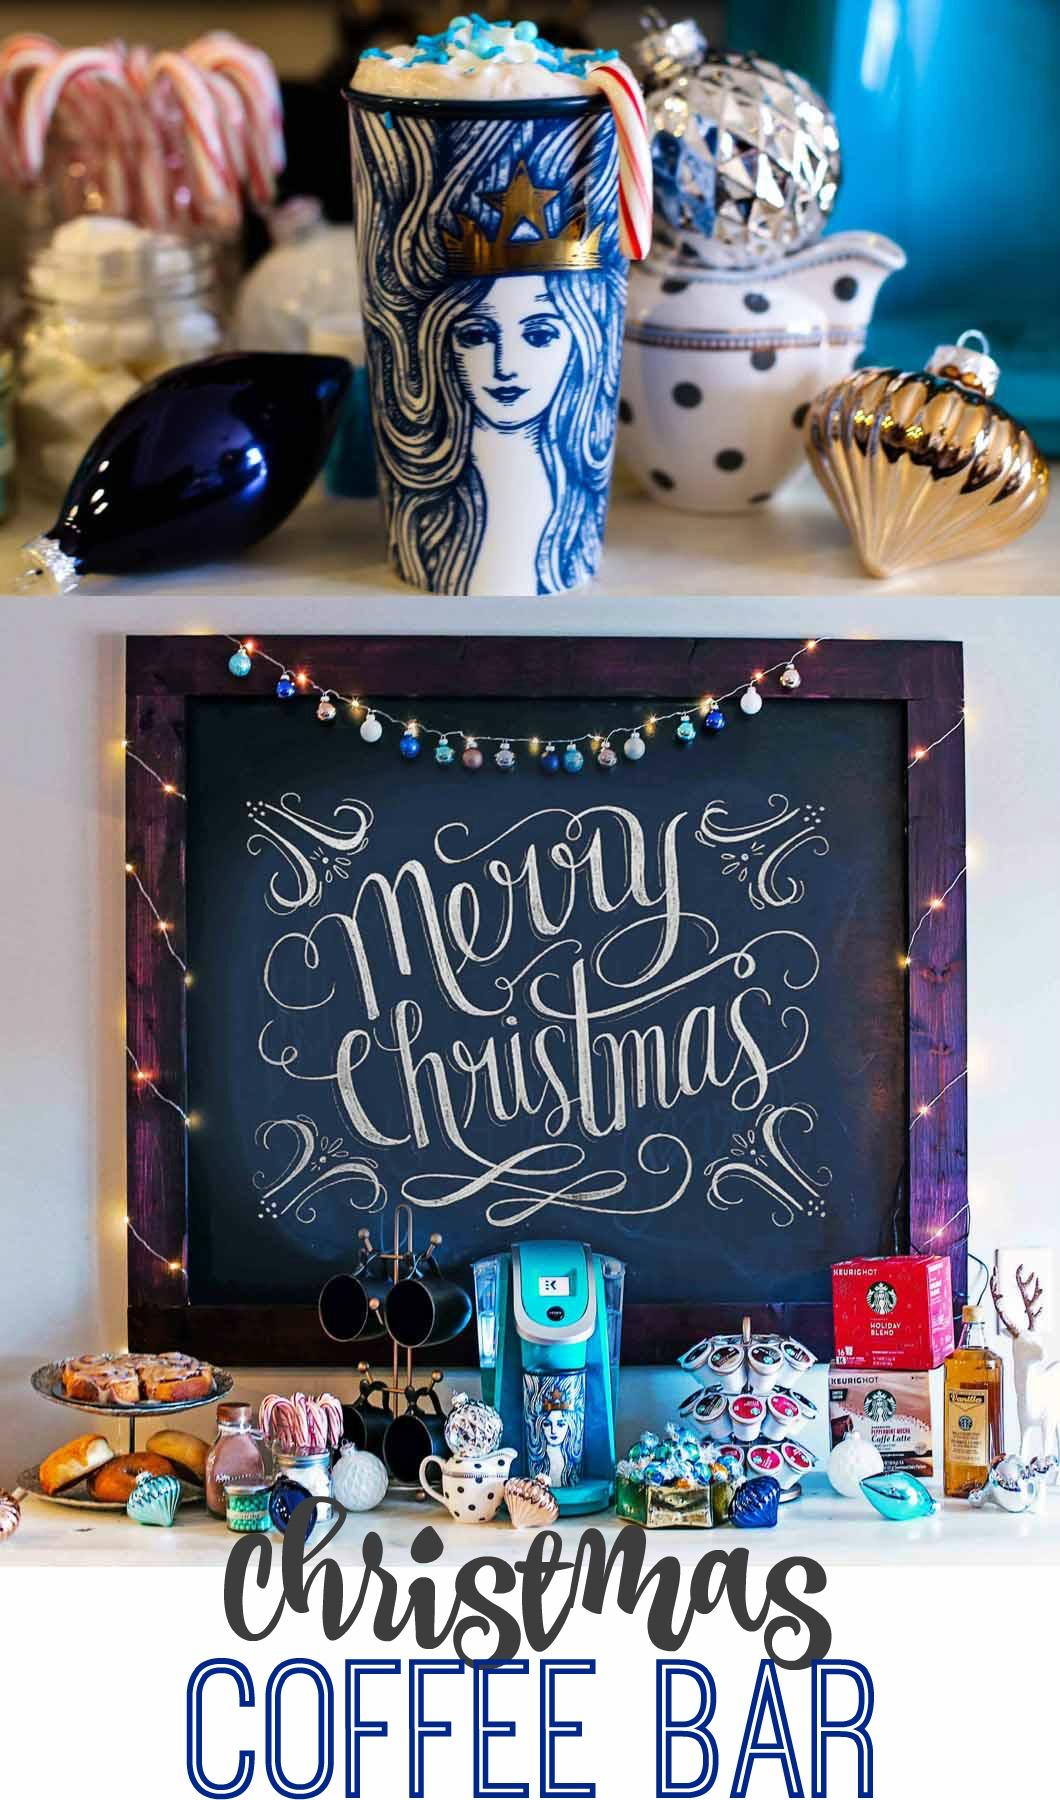 Christmas Coffee Bar with Starbucks - Starbucks Christmas Coffee Bar by Atlanta style blogger Happily Hughes